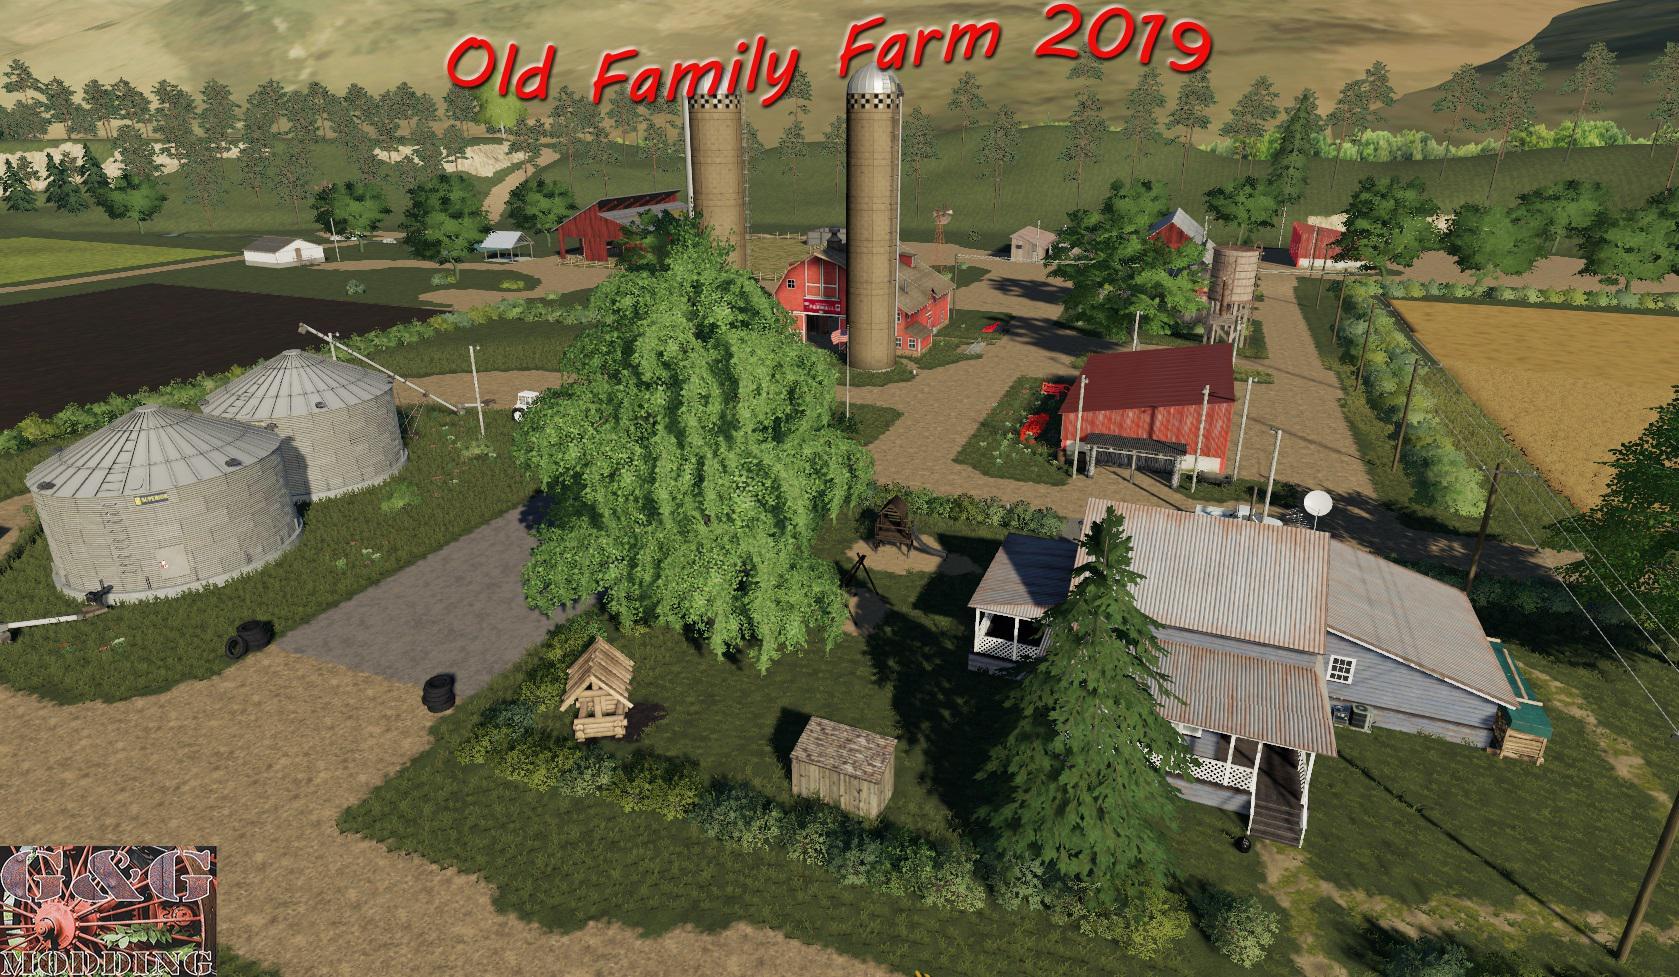 Old Family Farm v2.0 FS19 - Farming Simulator 19 Mod ...  Old Family Farm...